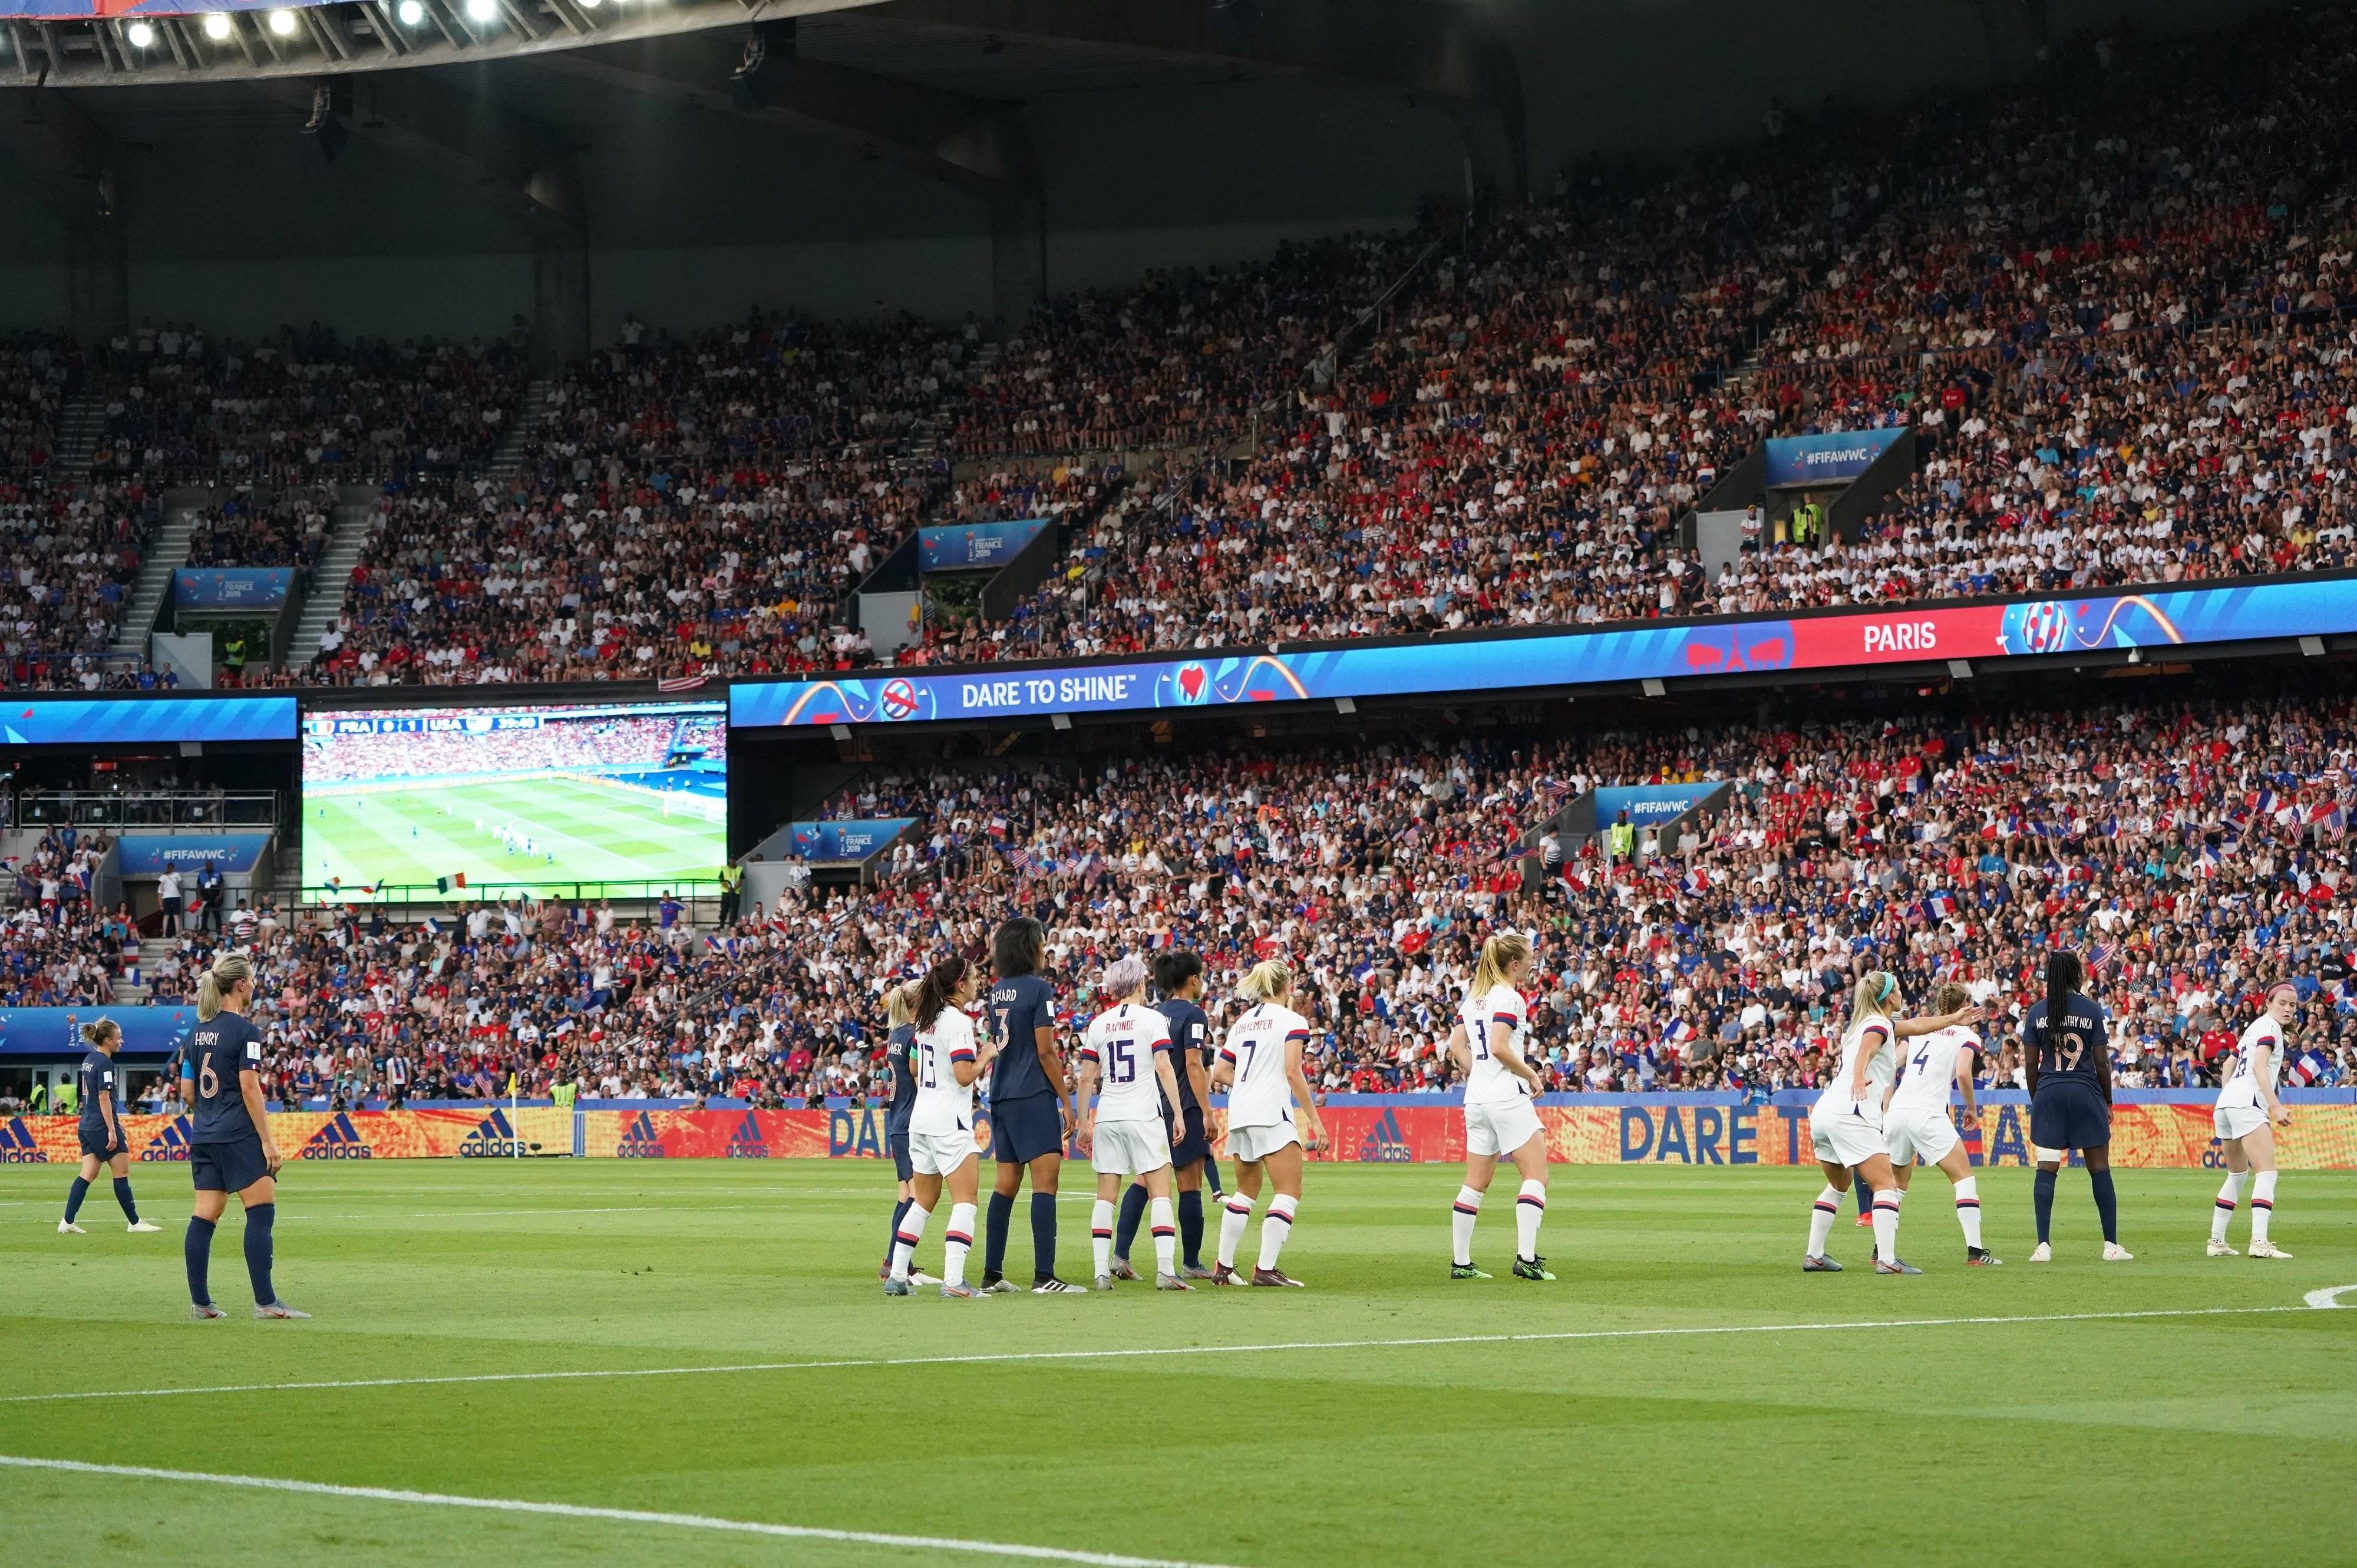 Coupe du monde féminine 2019 France-USA